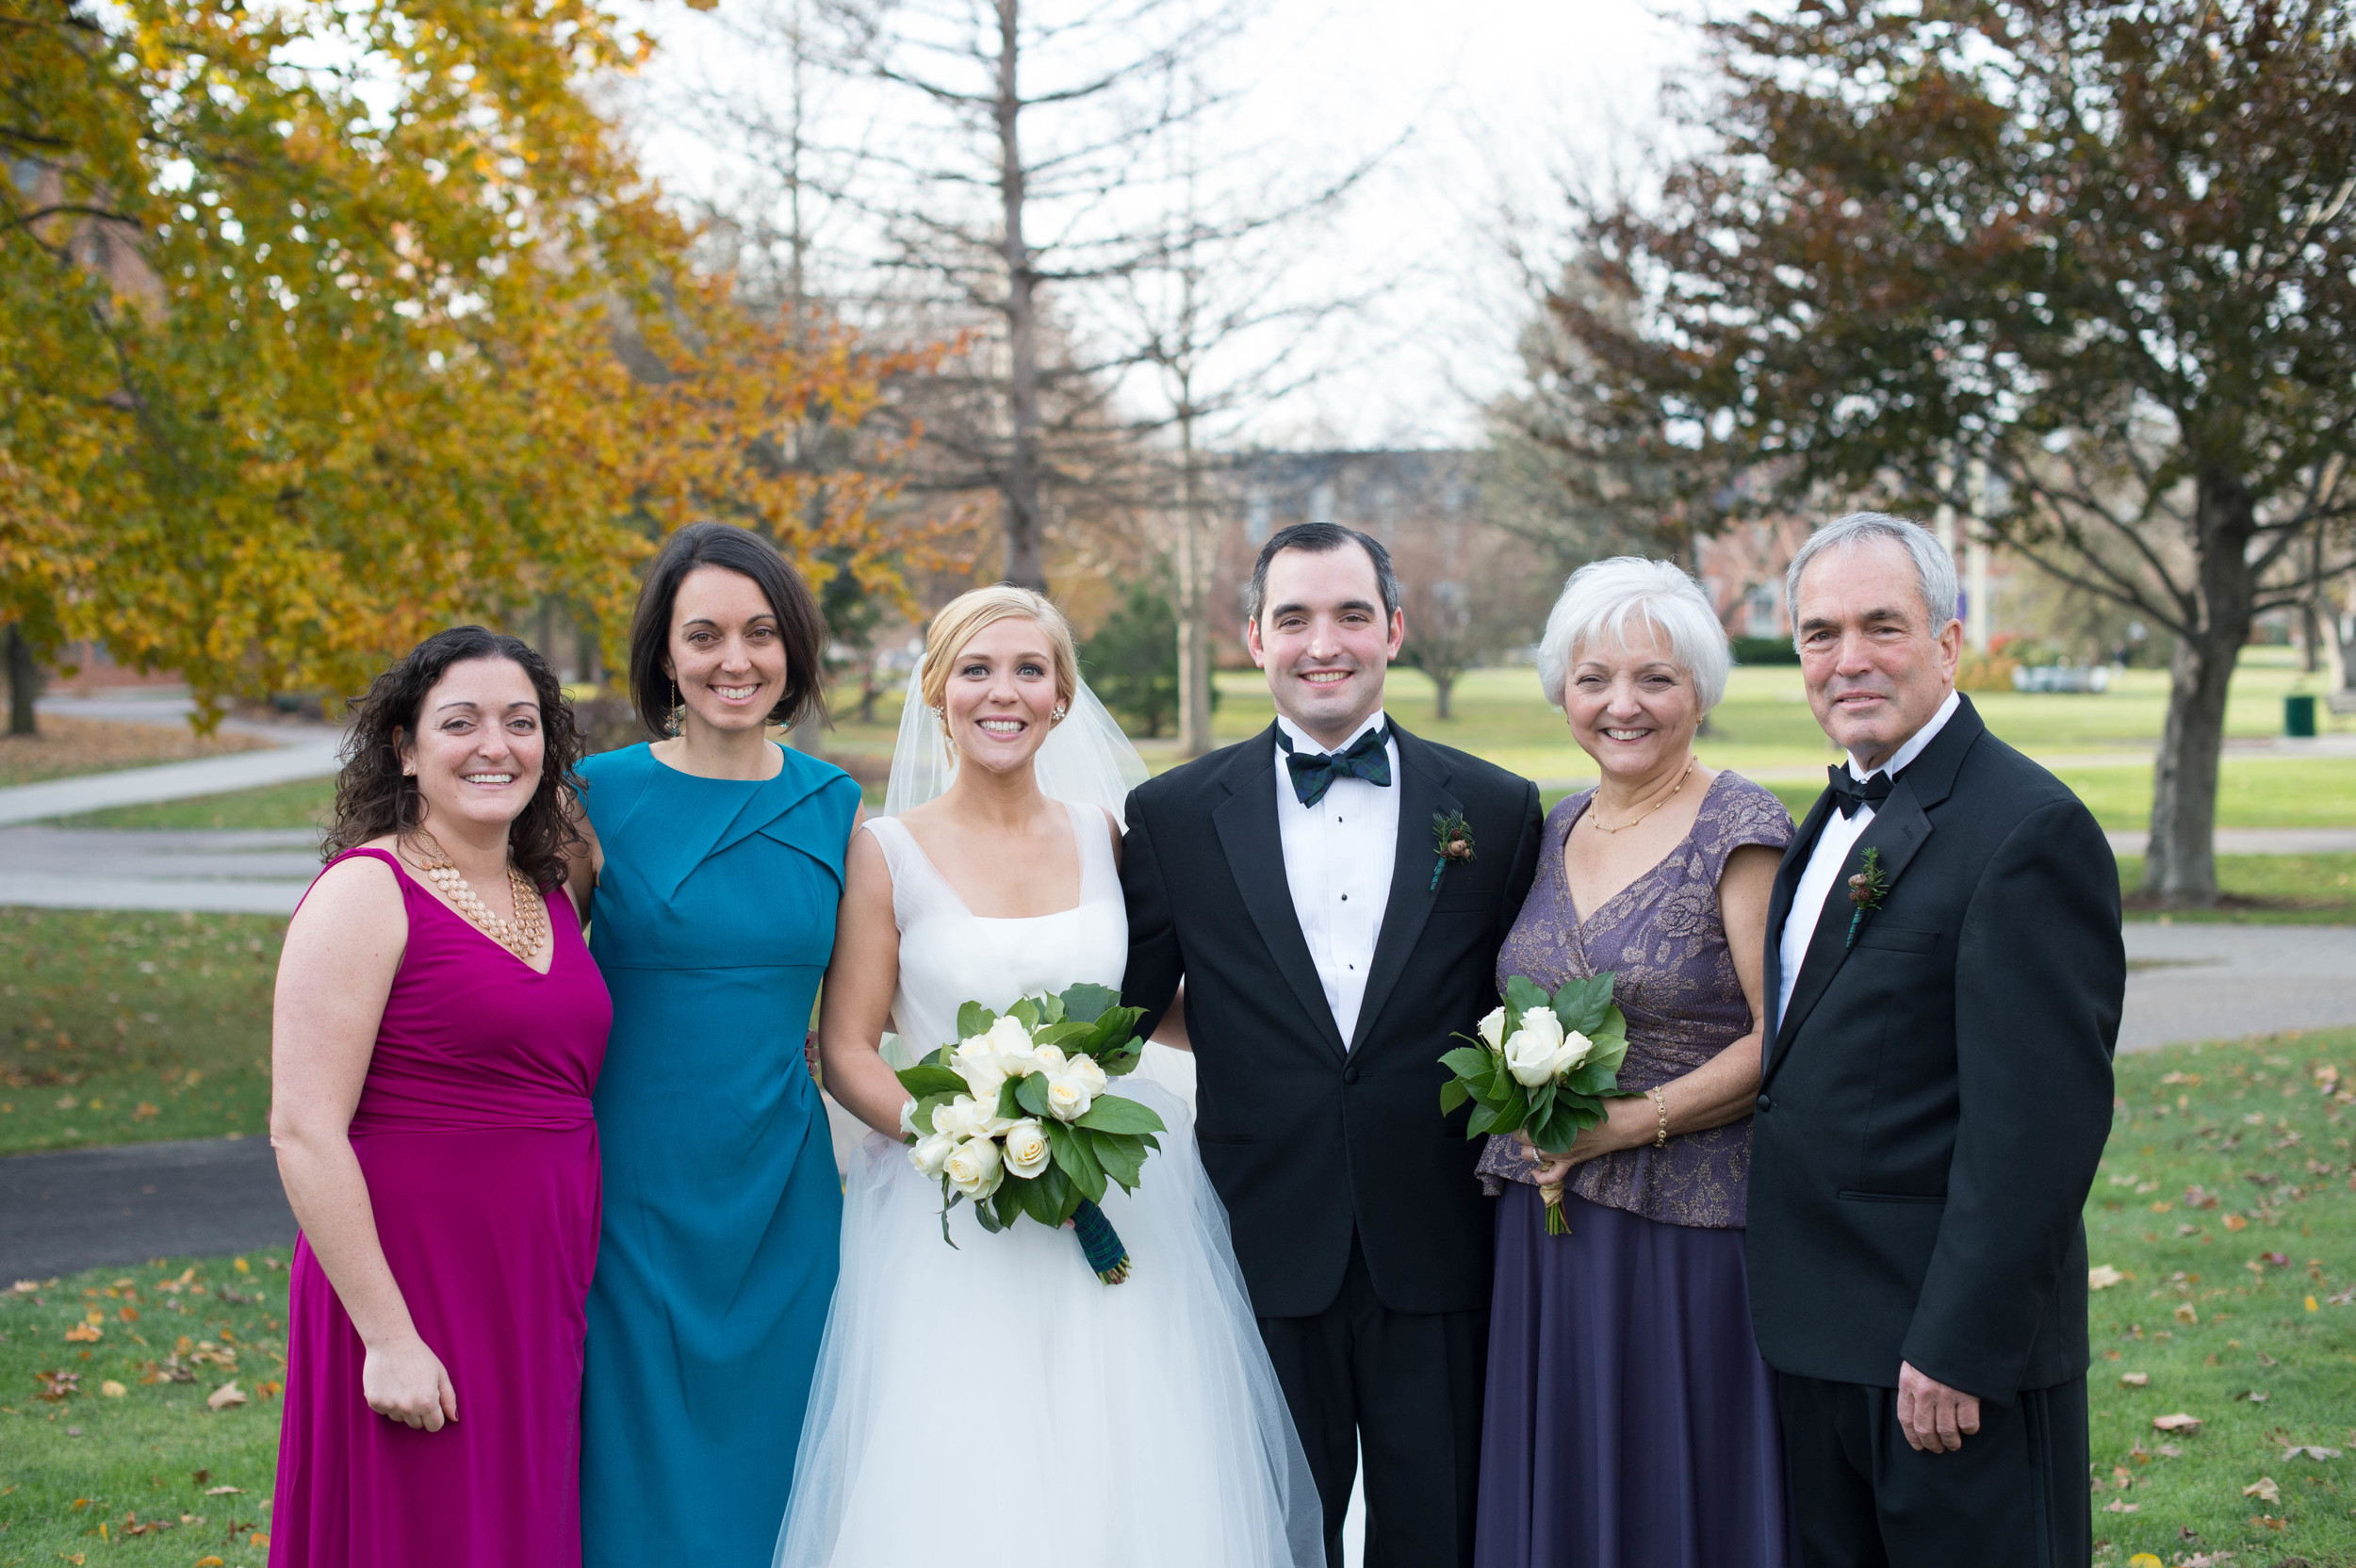 The_Ponds_Vermont_Wedding_Photo-56.jpg